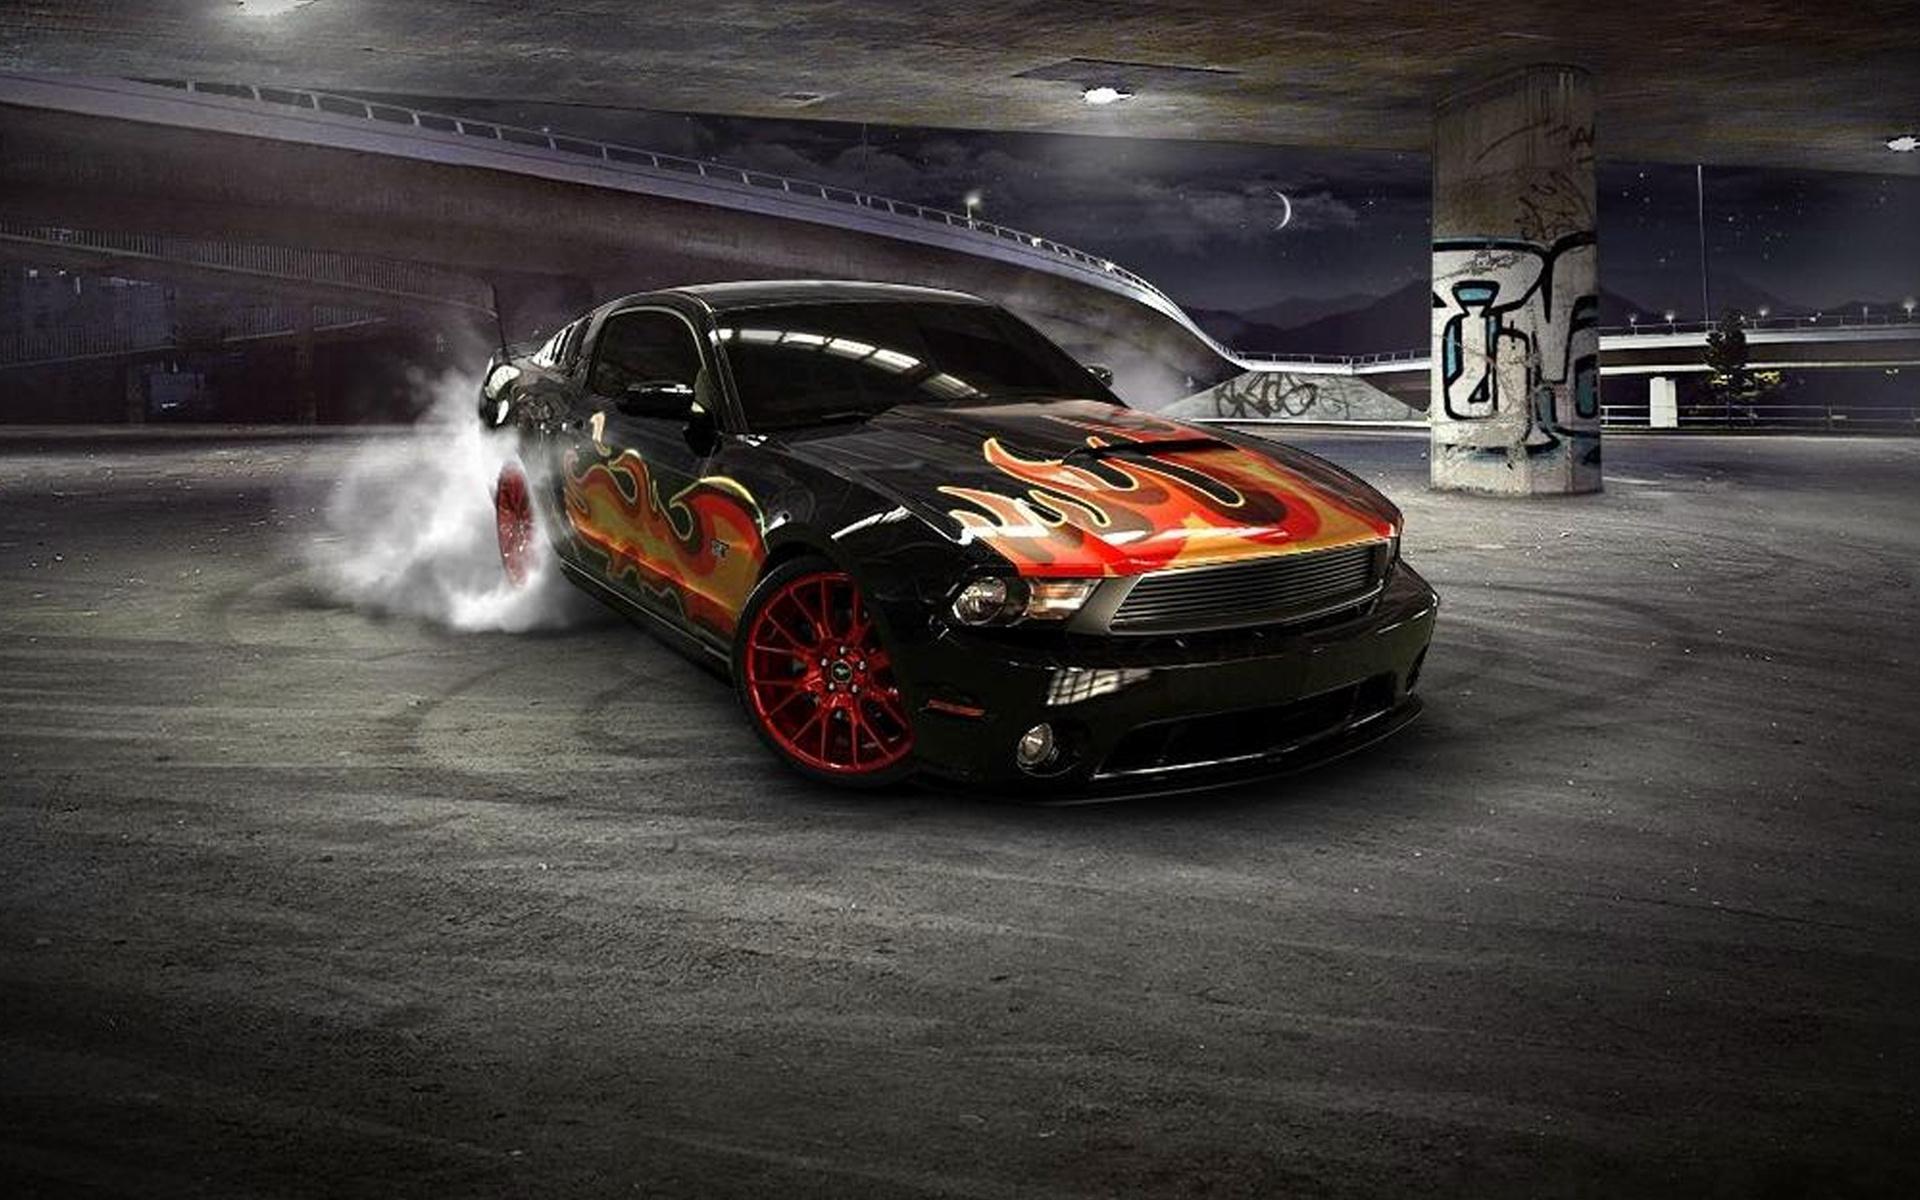 Hot Race Car Girls